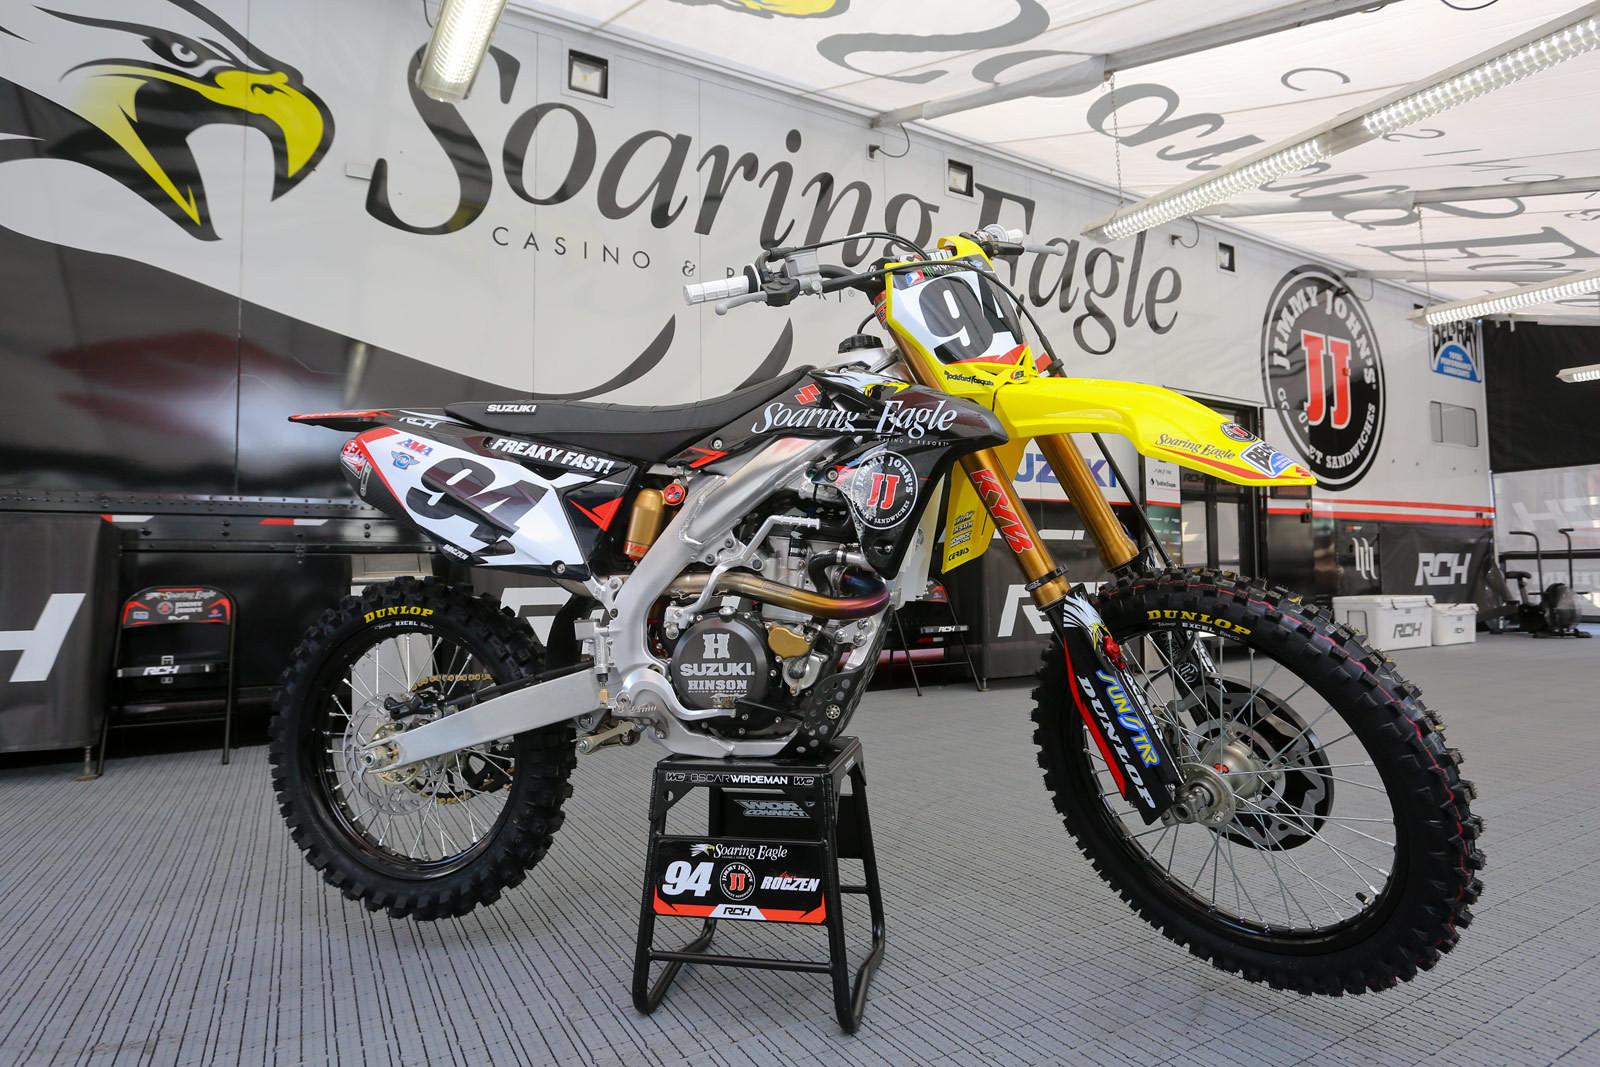 Ken Roczen - 2016 Bikes of Supercross - Motocross Pictures - Vital MX